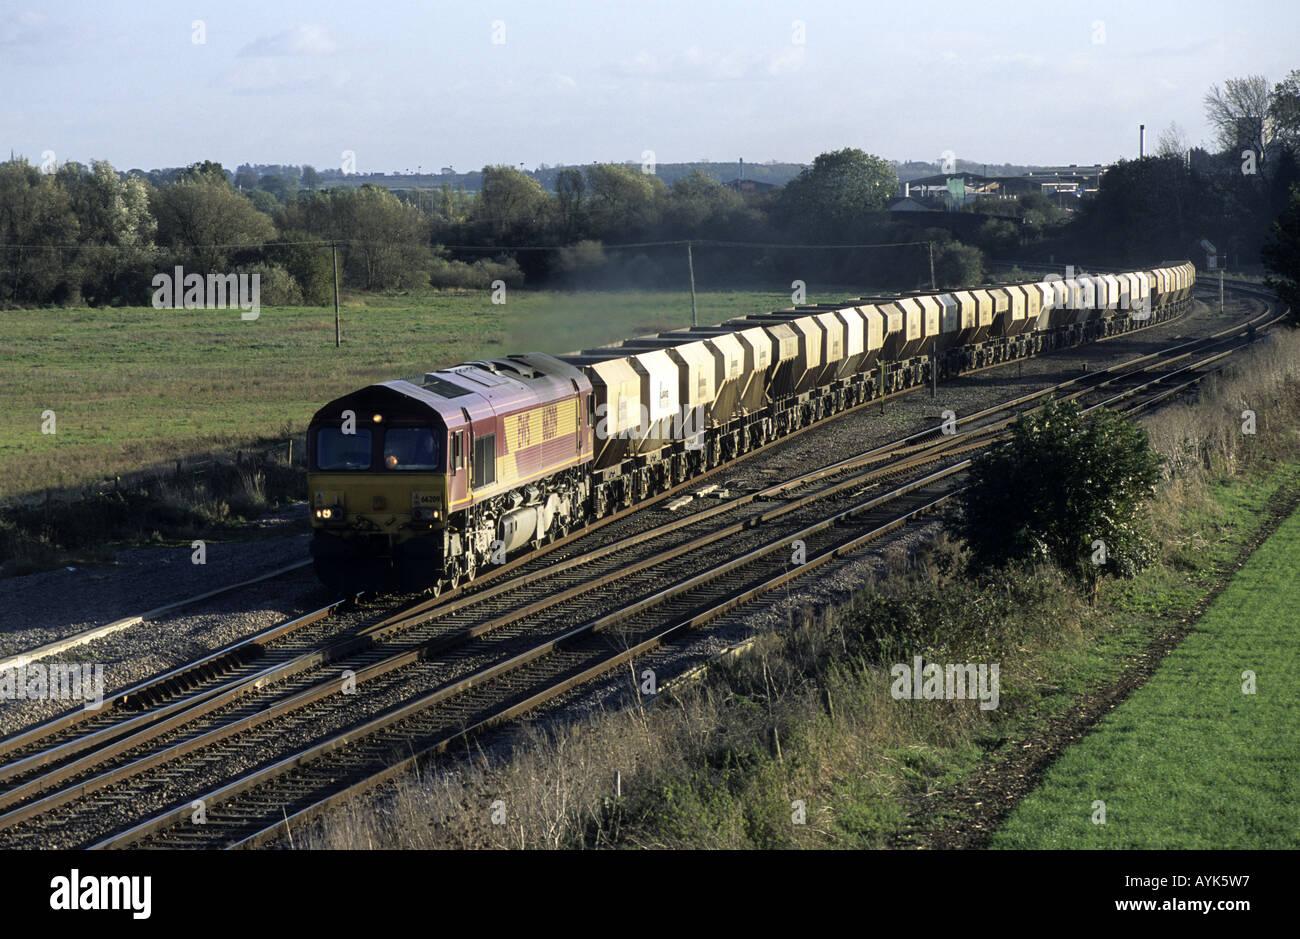 Freight train on Midland Main Line, Northamptonshire, England, UK - Stock Image